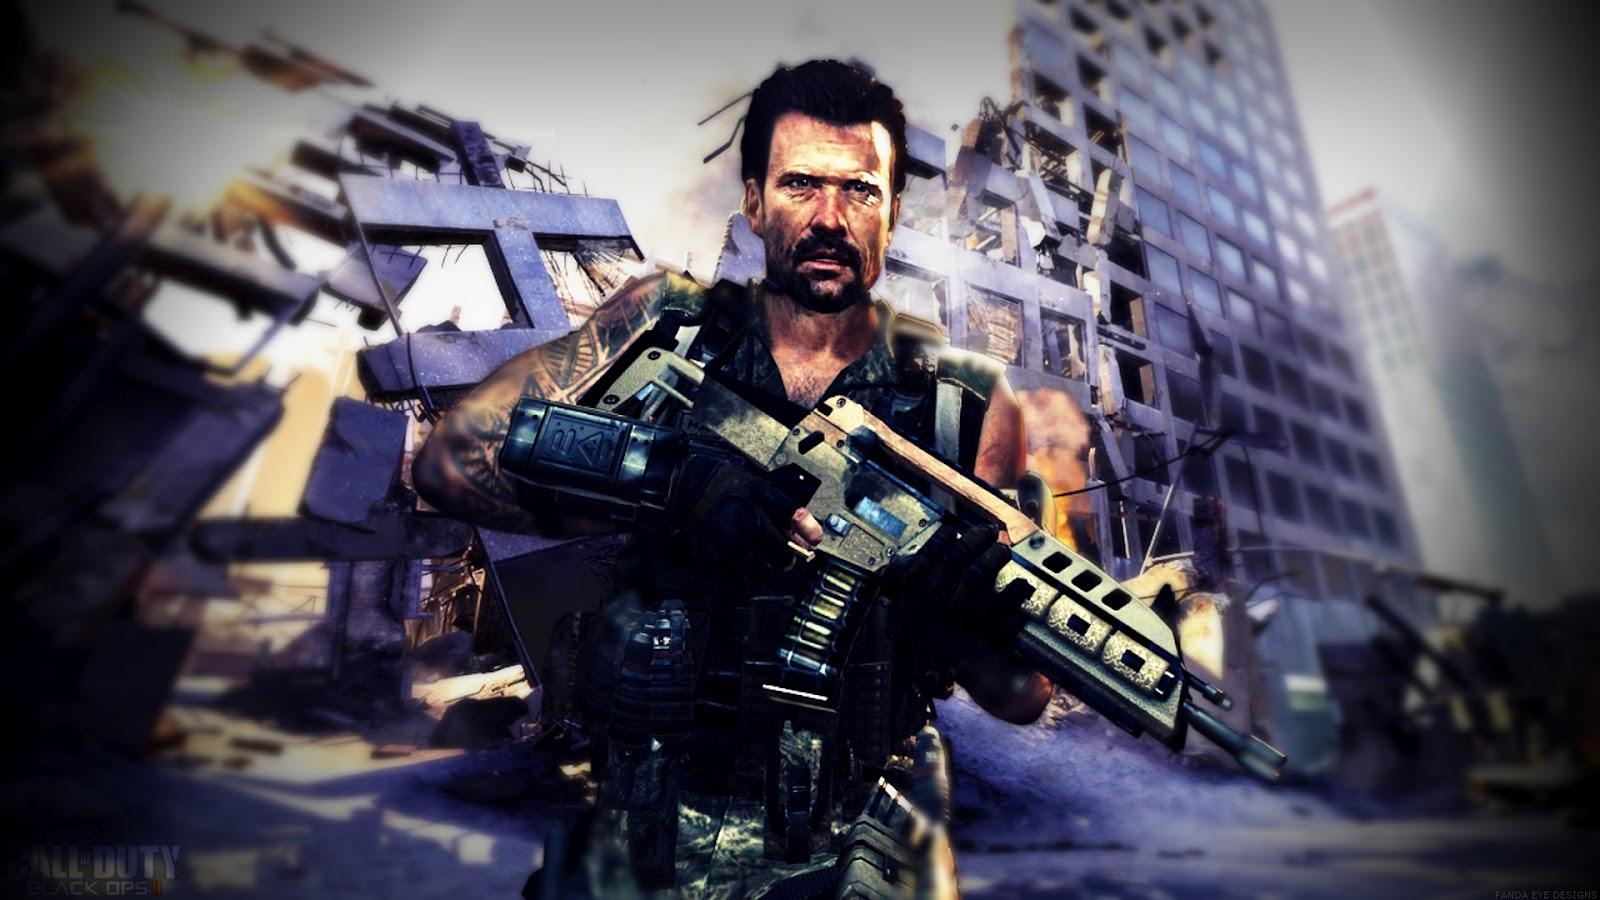 Picsholic Call Of Duty Black Ops 2 Hd Wallpaper 1080p